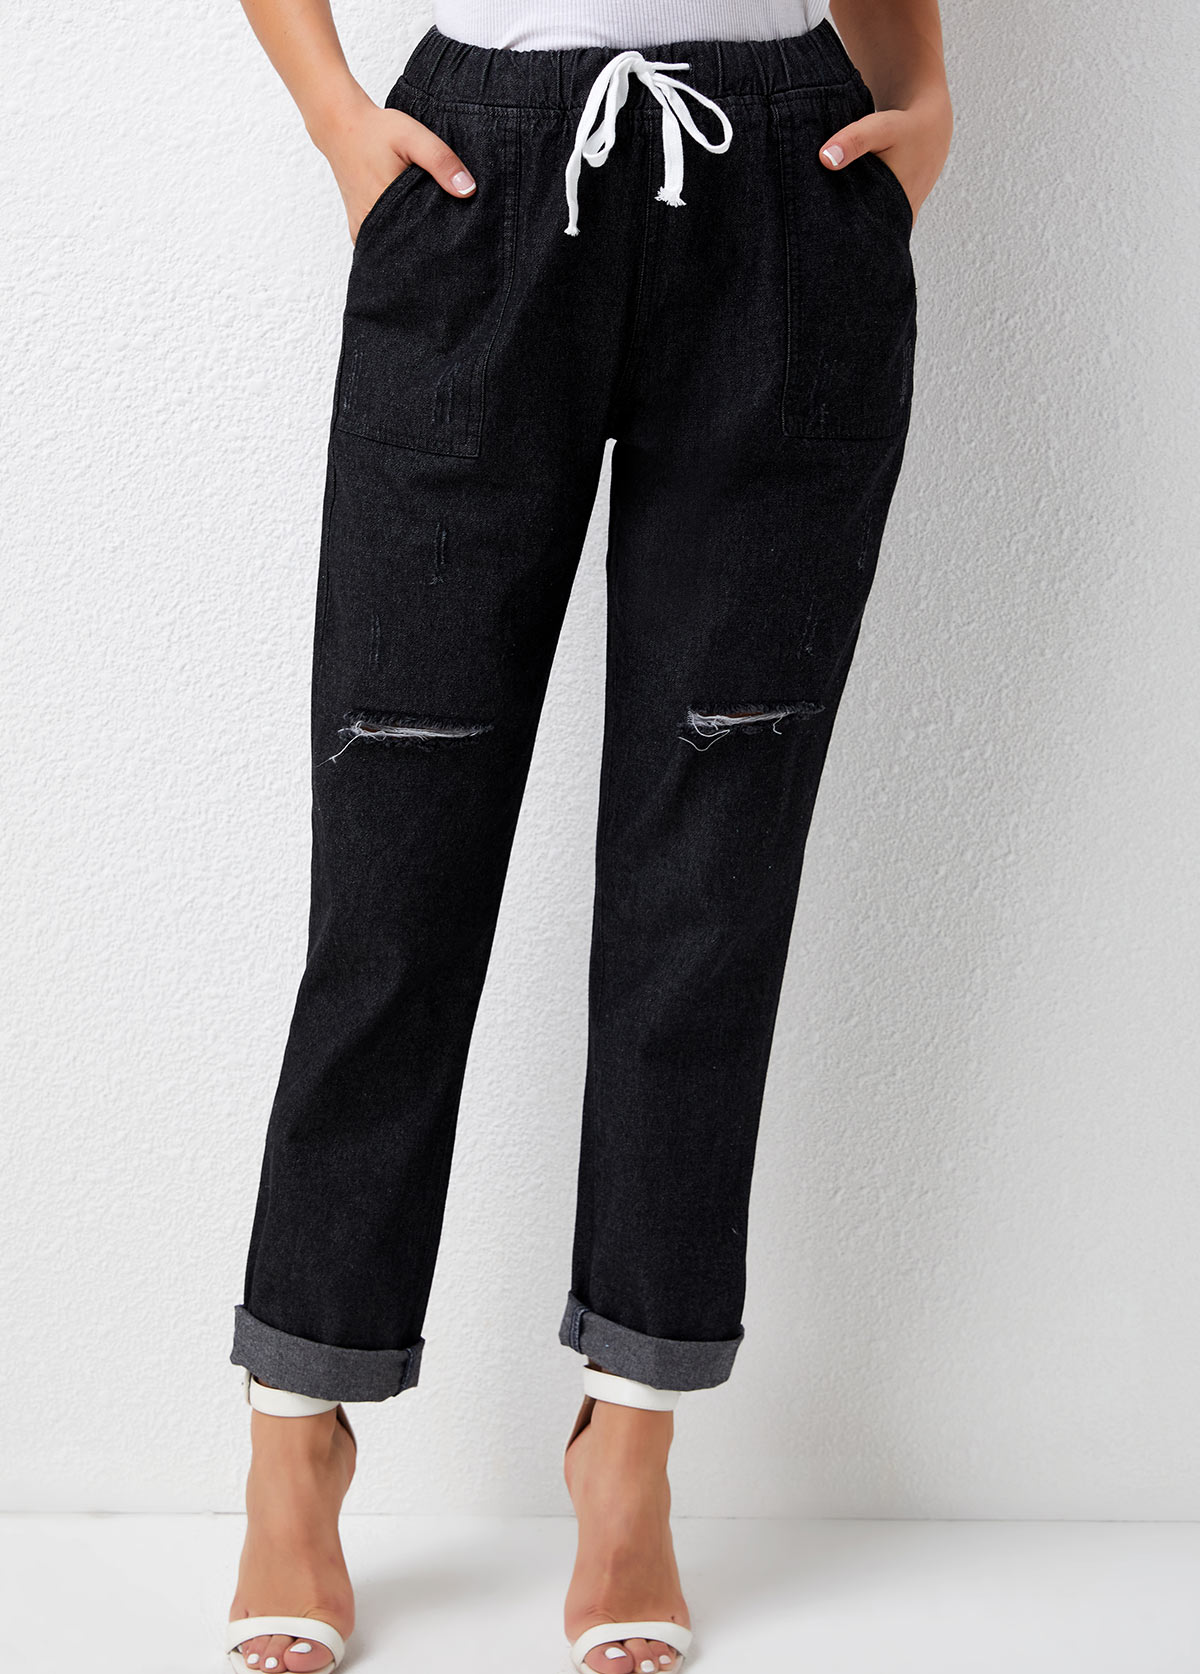 Shredded Drawstring Waist Pocket Solid Pants